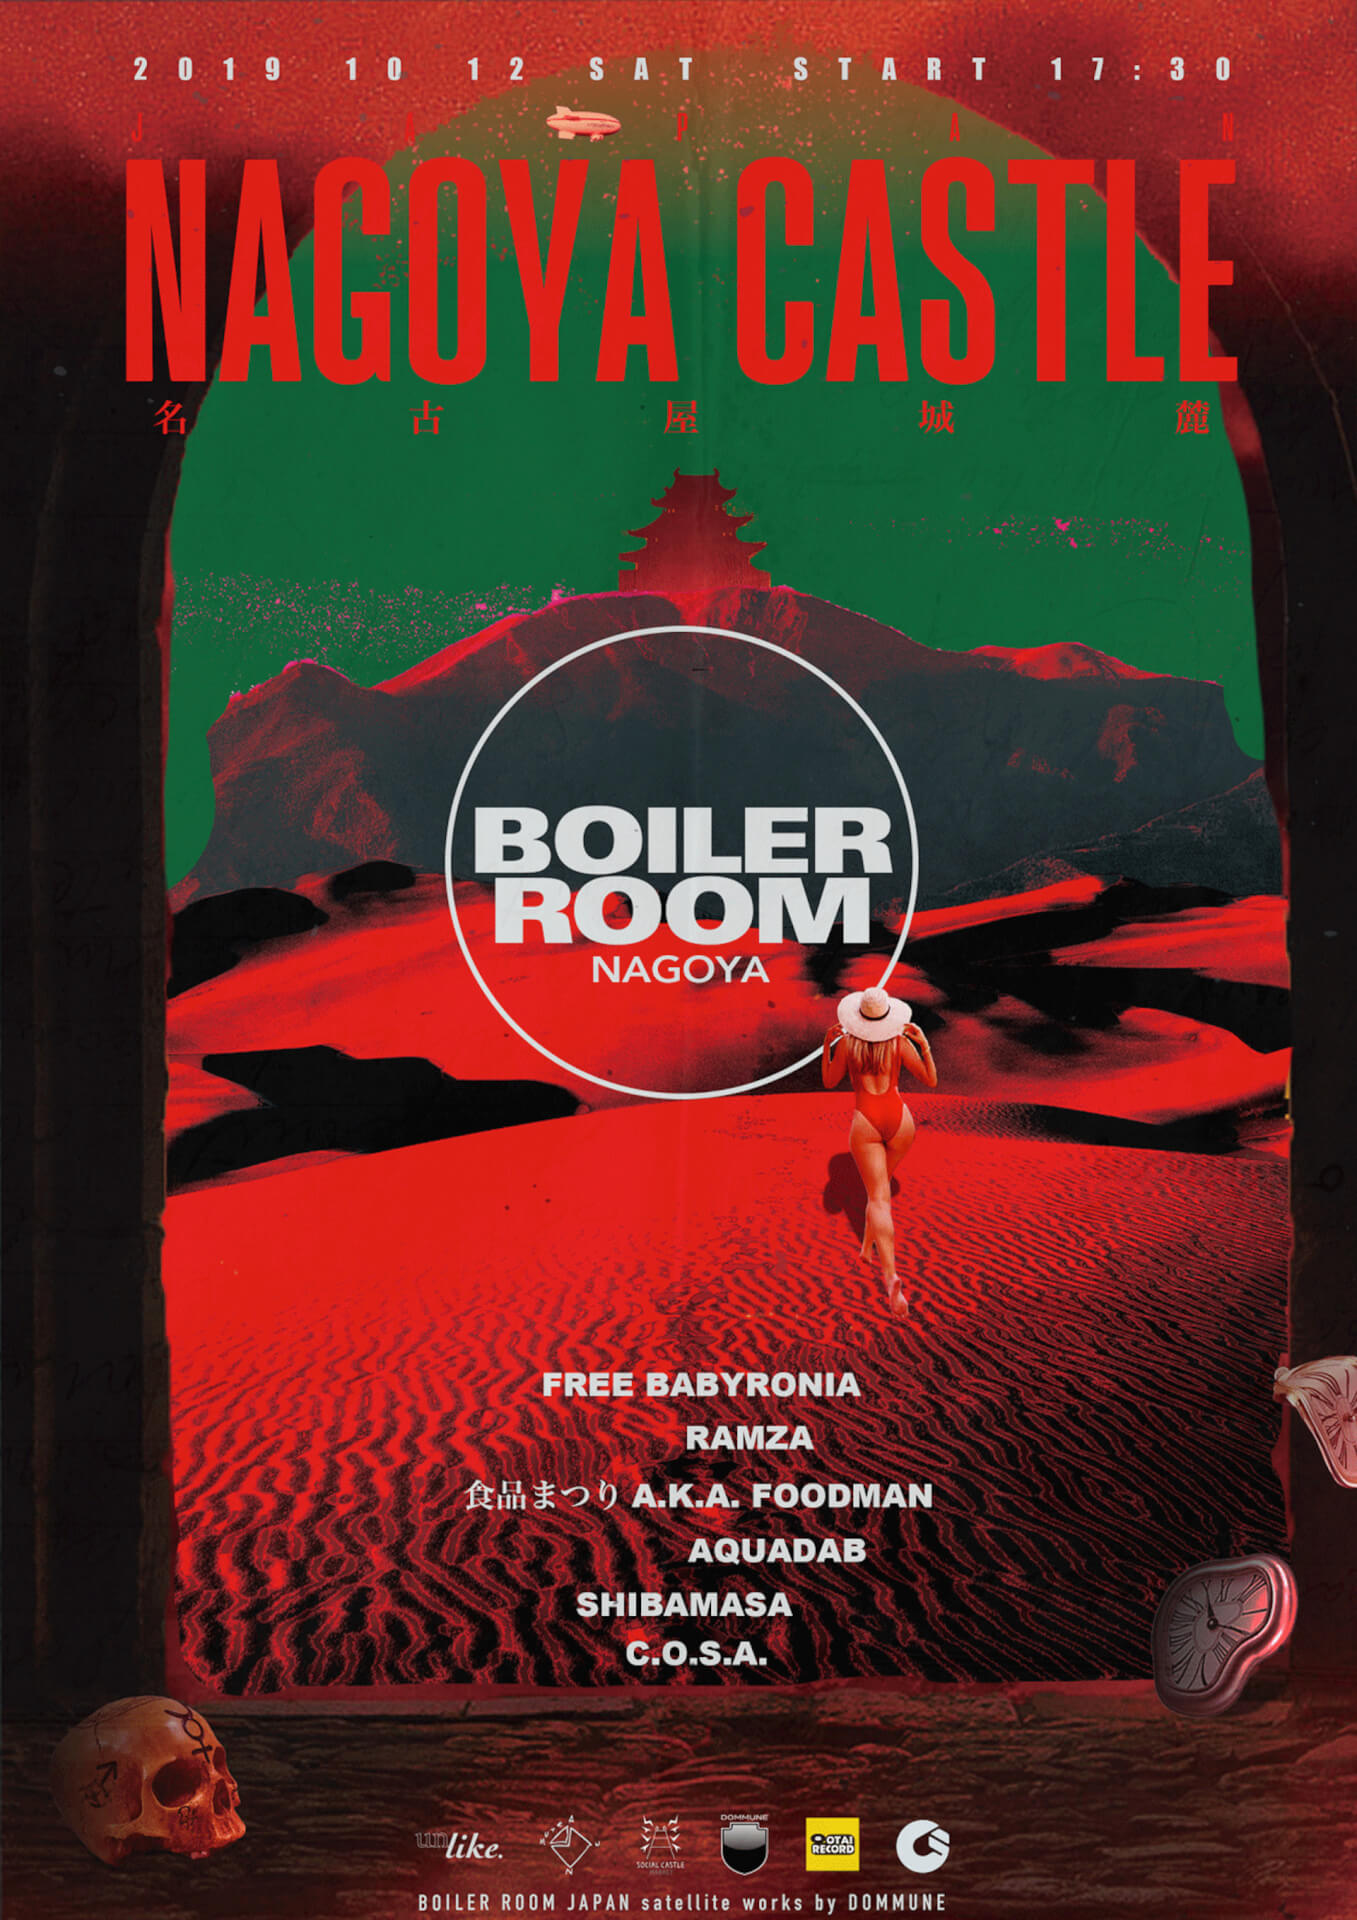 <Boiler Room>初の名古屋開催が決定!名古屋城天守閣前にC.O.S.A.、RAMZA、食品まつり A.K.A. FOODMANらが登場 music190925_boilerroom_nagoya_1